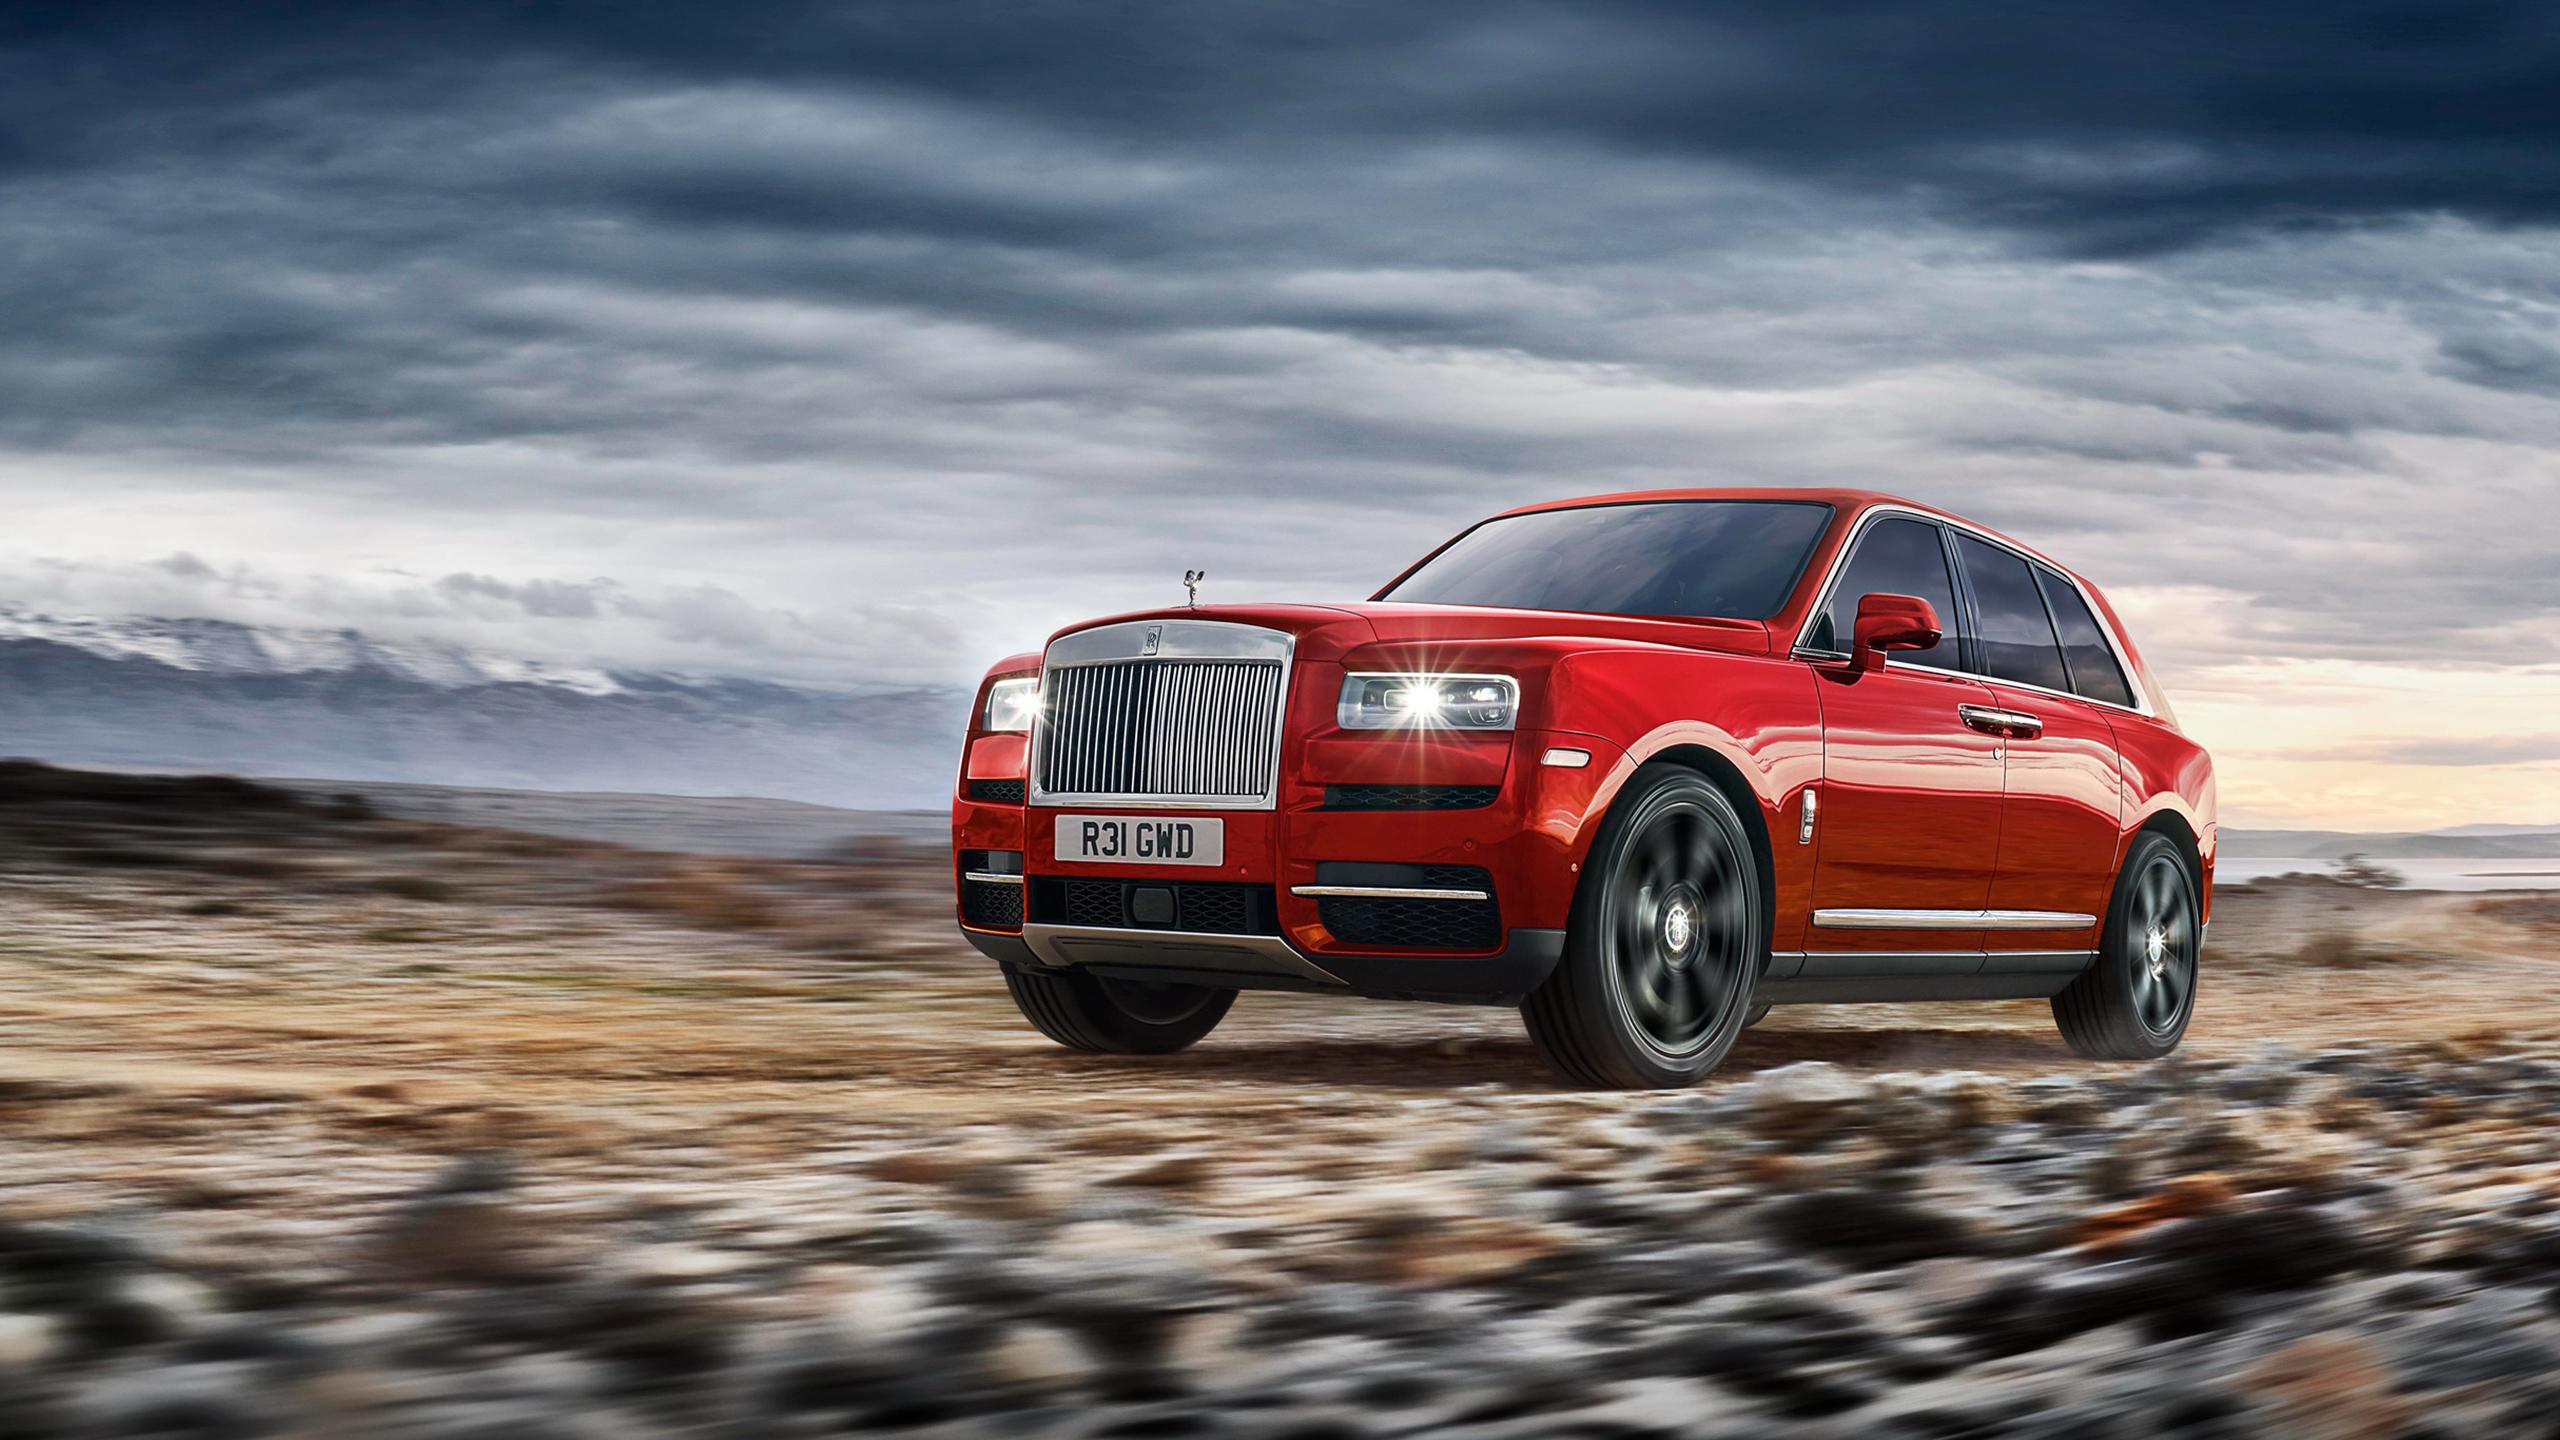 2018 Rolls-Royce Cullinan 4K 9 Wallpaper | HD Car ...